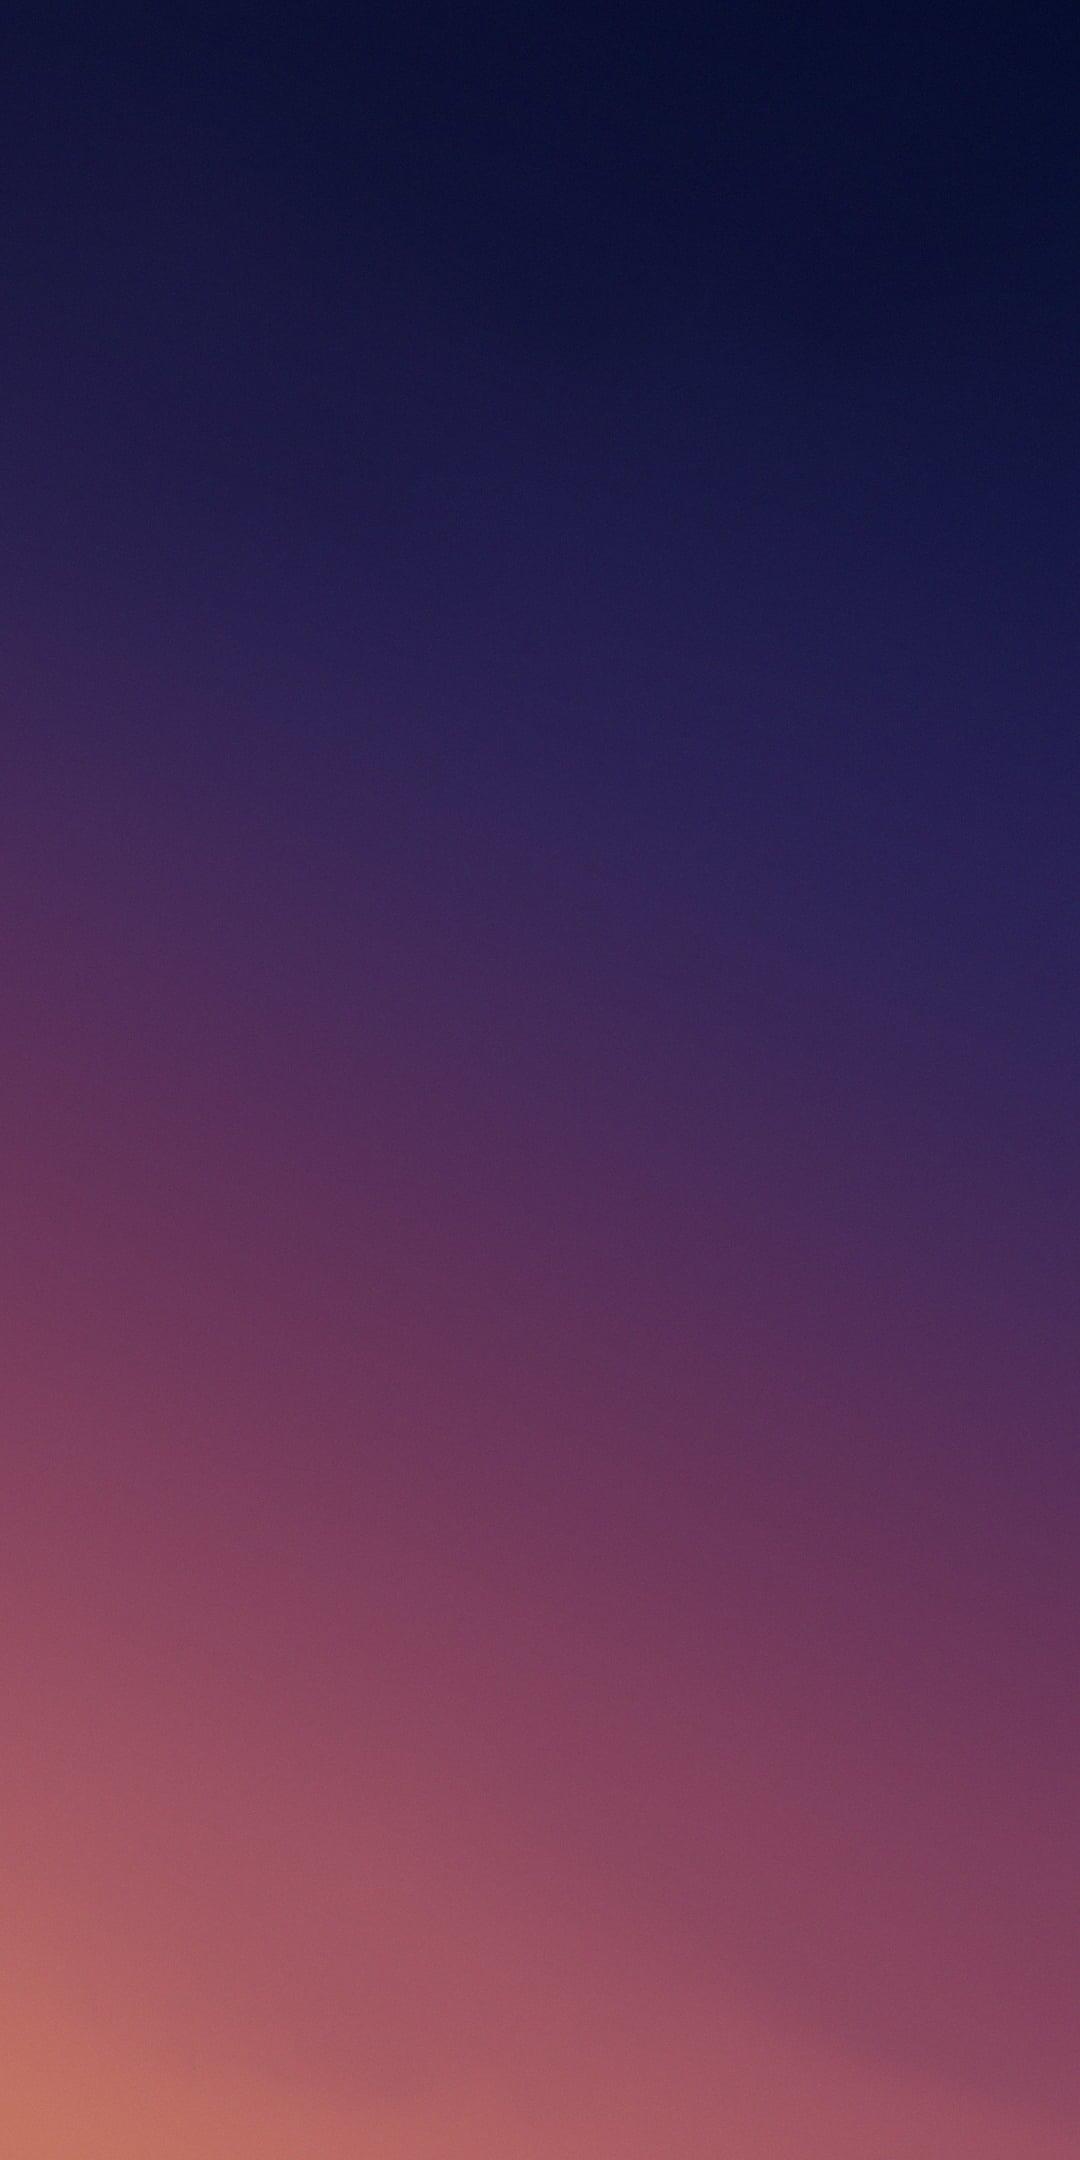 Xiaomi Mi 8 Pro Wallpapers Download 15